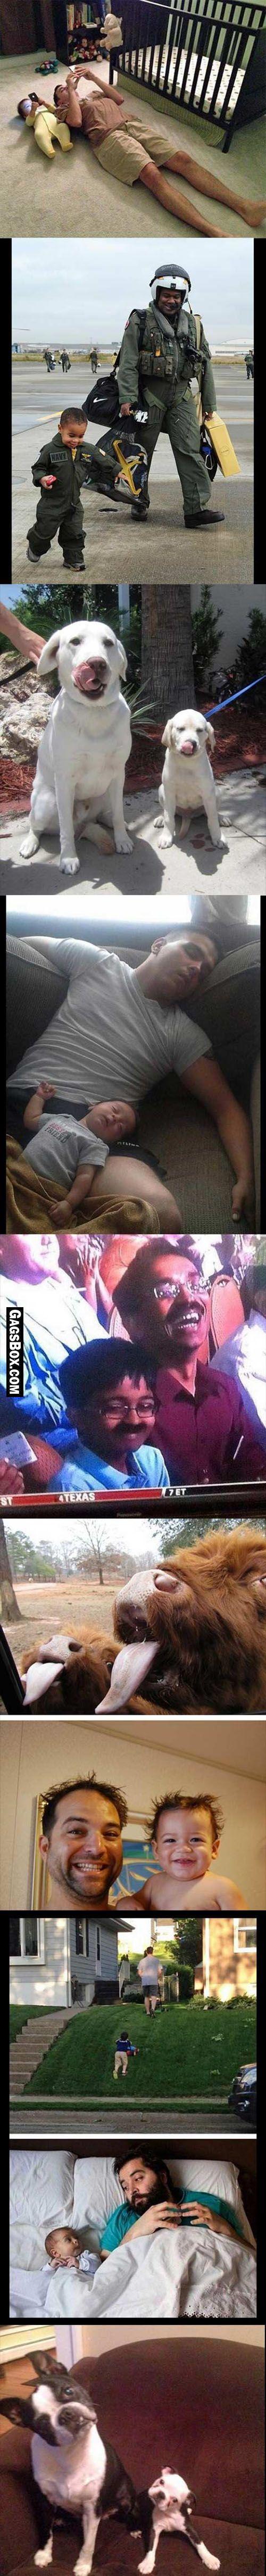 Father And Son - #funny, #lol, #fun, #humor, #comics, #meme, #gag, #lolpics, #Funnypics,